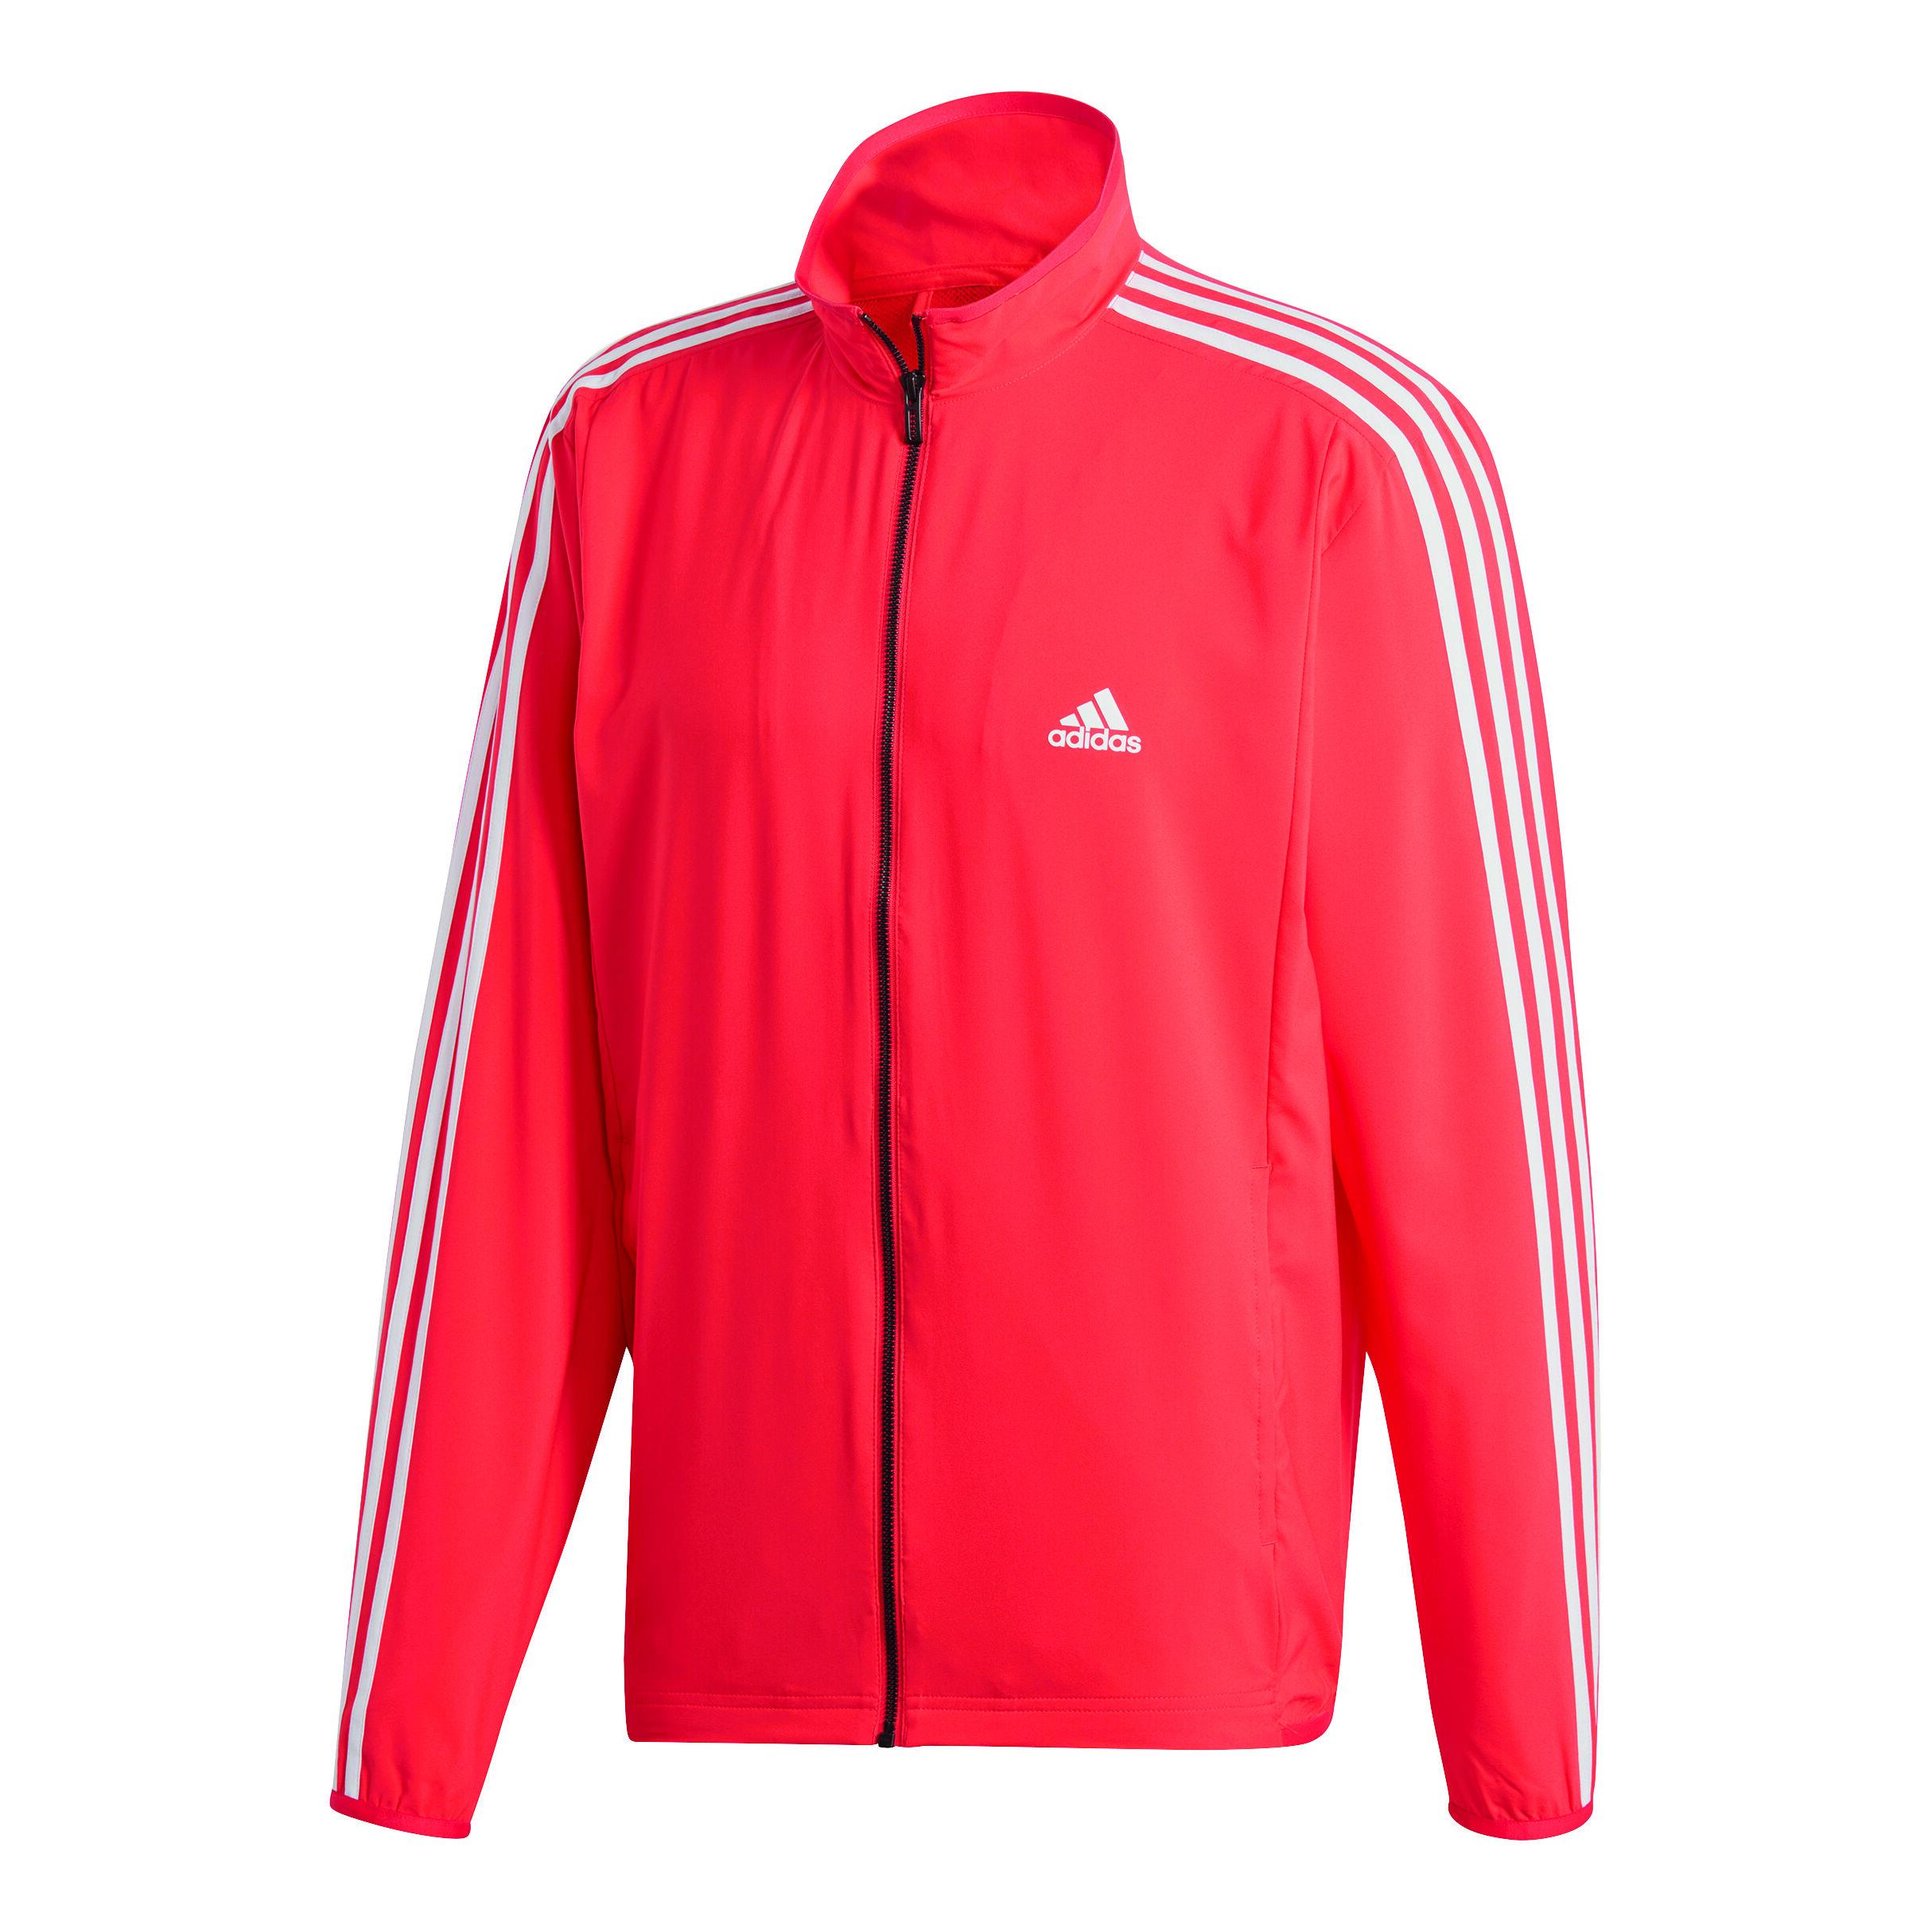 adidas sportschuhe, adidas Woven Light Trainingsanzug